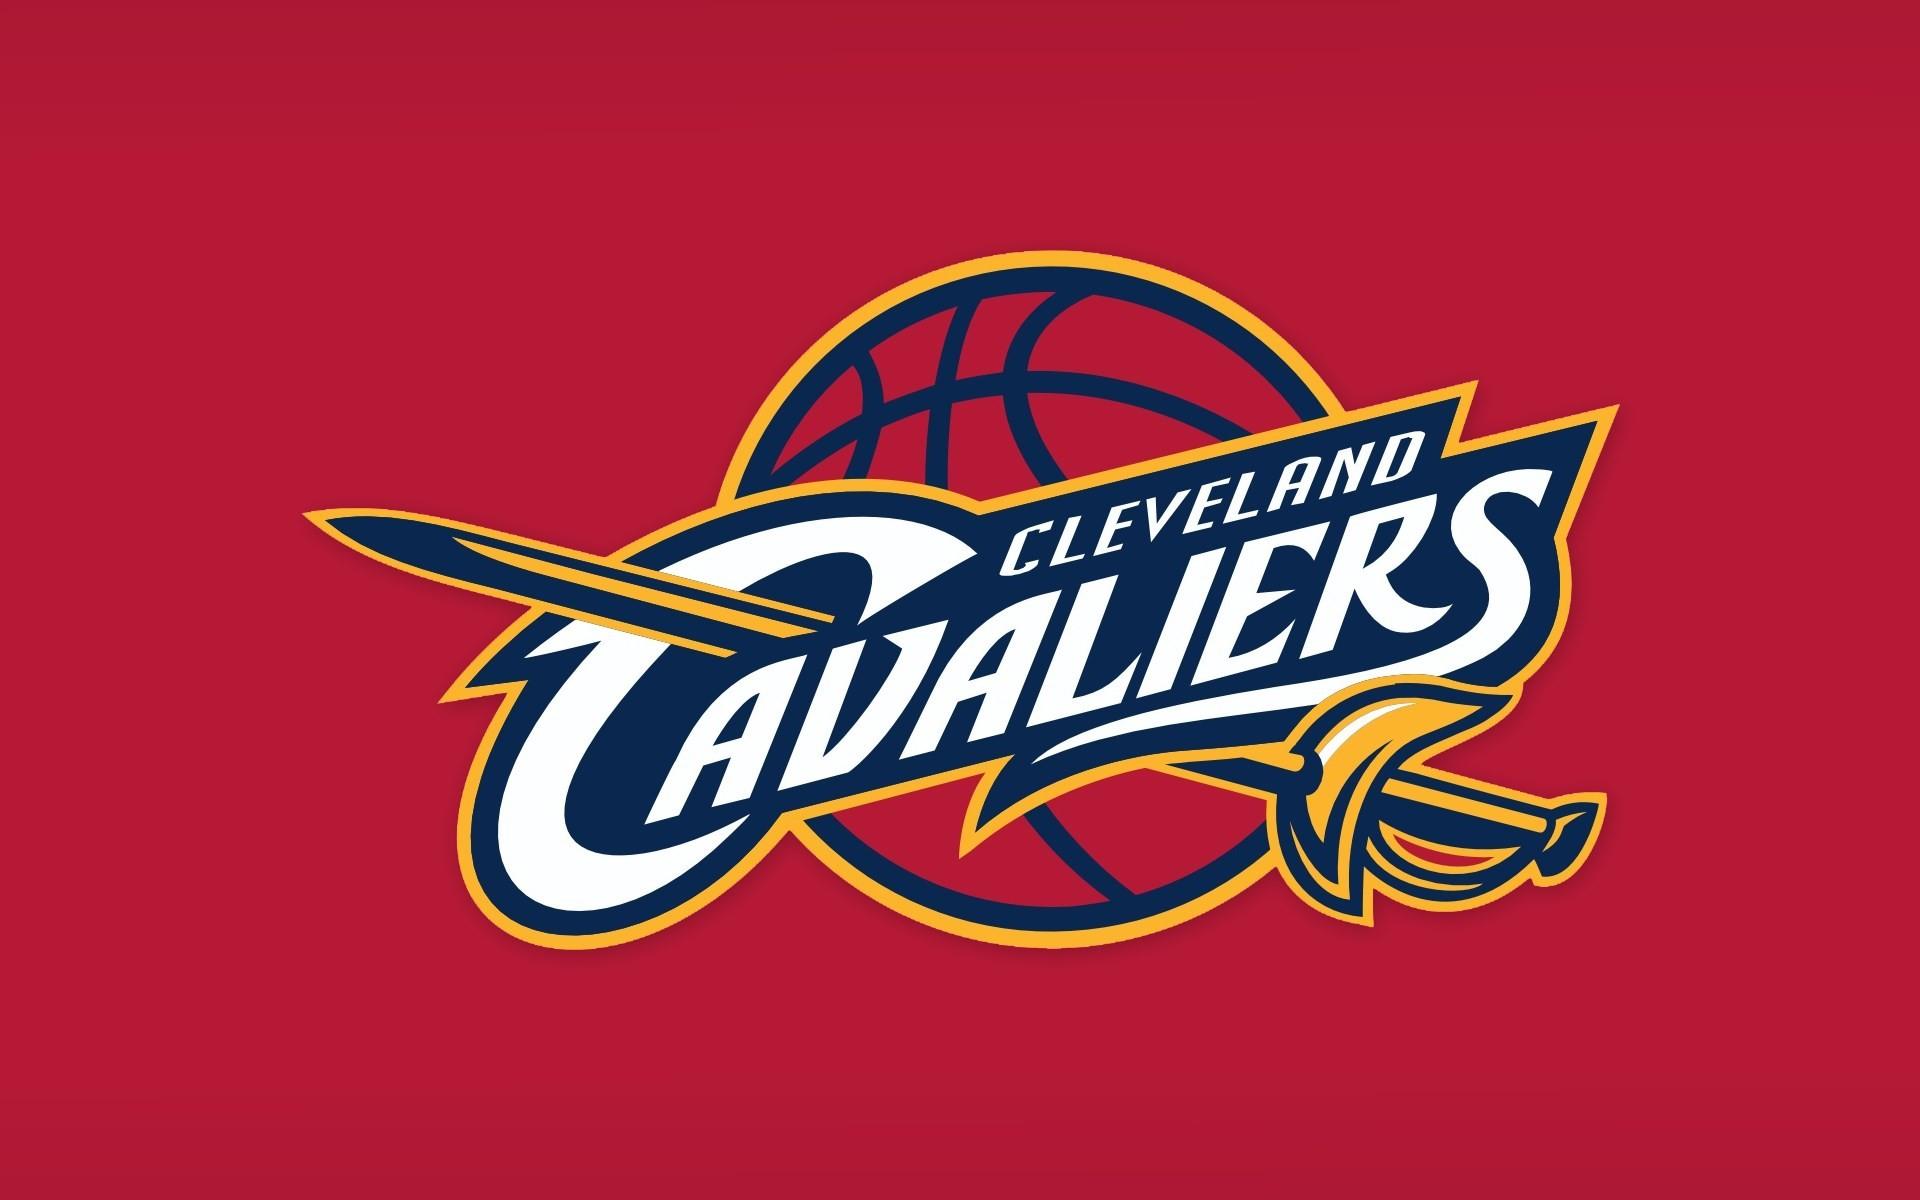 Fan Wallpapers | Cleveland Cavaliers | Download Wallpaper | Pinterest |  Wallpaper